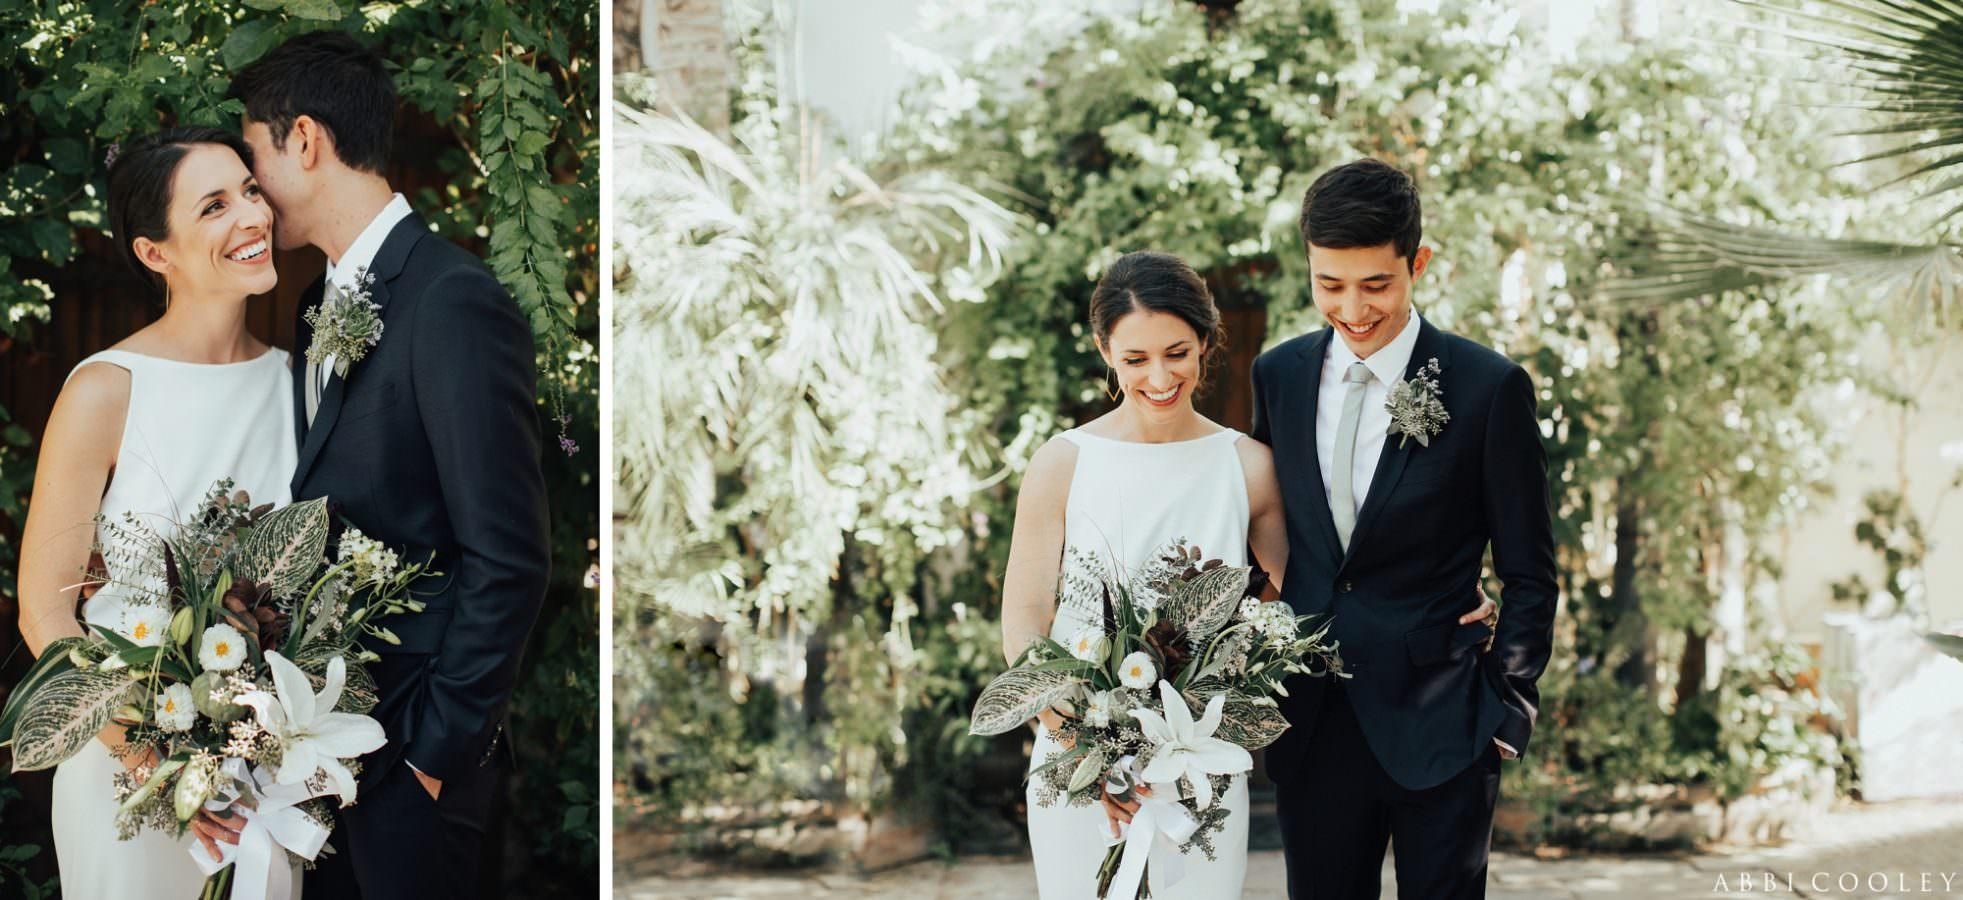 ABBI COOLEY PALM SPRINGS WEDDING_0787